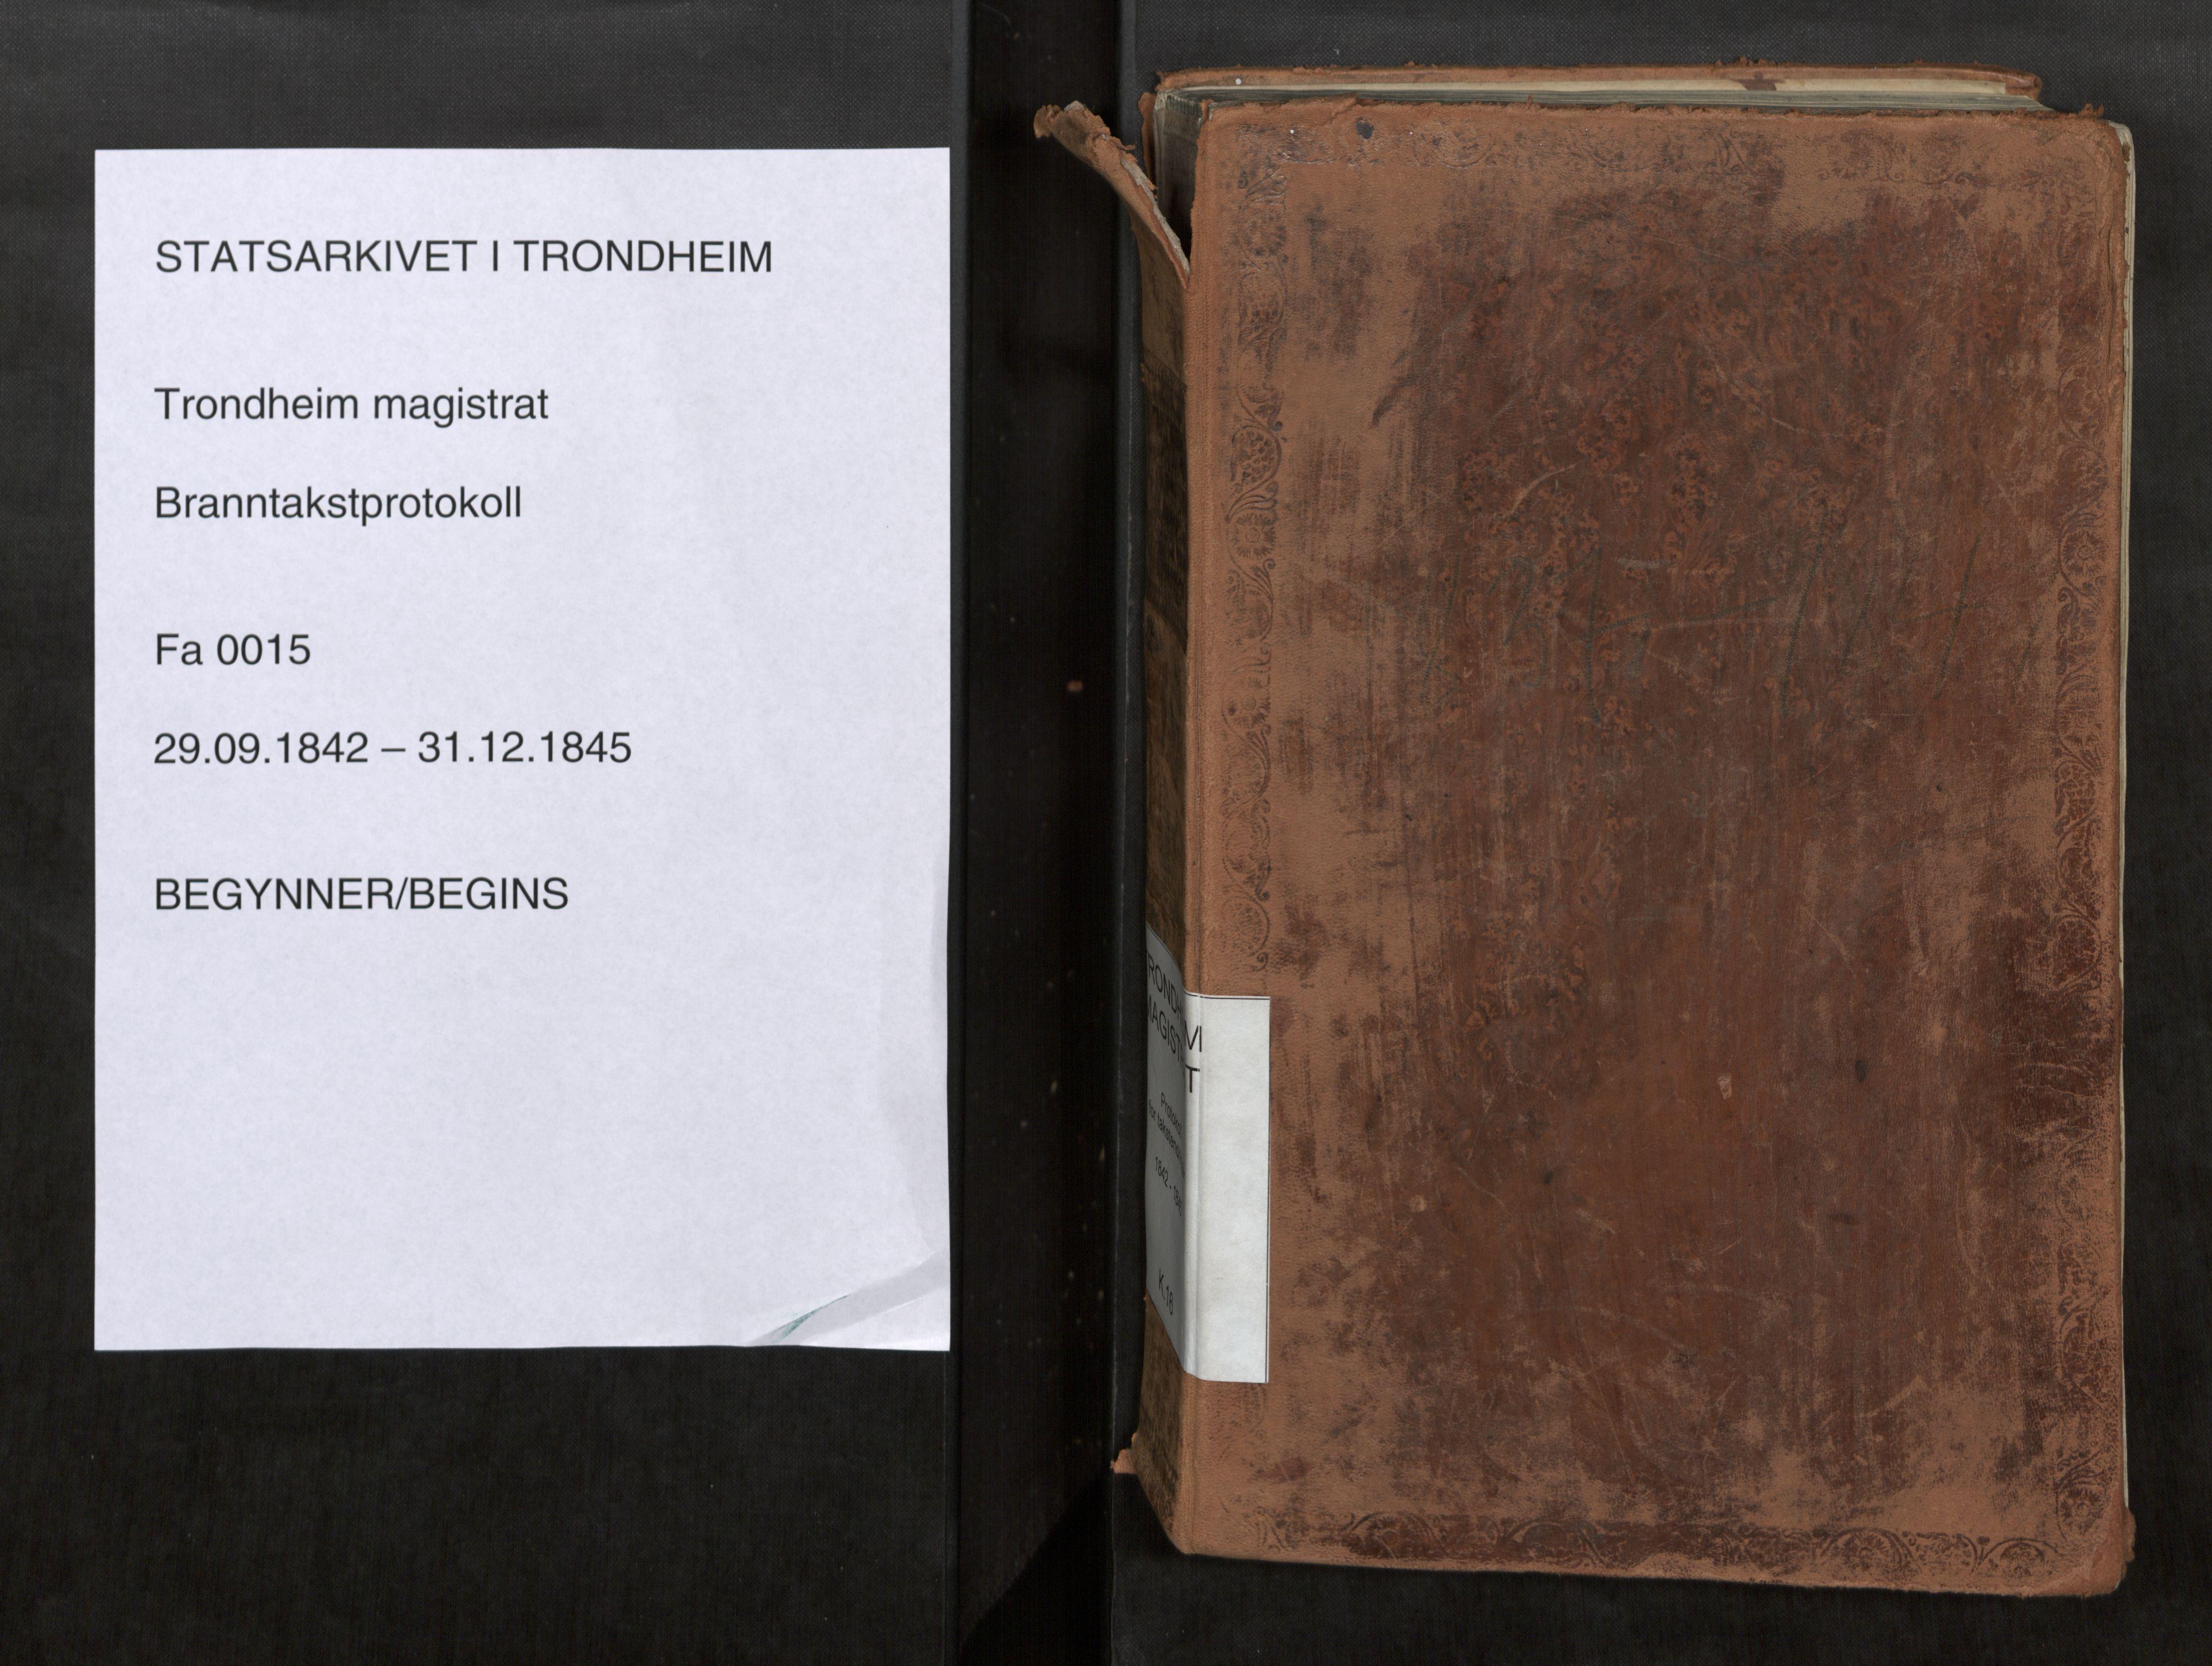 SAT, Norges Brannkasse Trondheim magistrat, Branntakstprotokoller med tekst, nr. 15: 1842-1845, 1842-1845